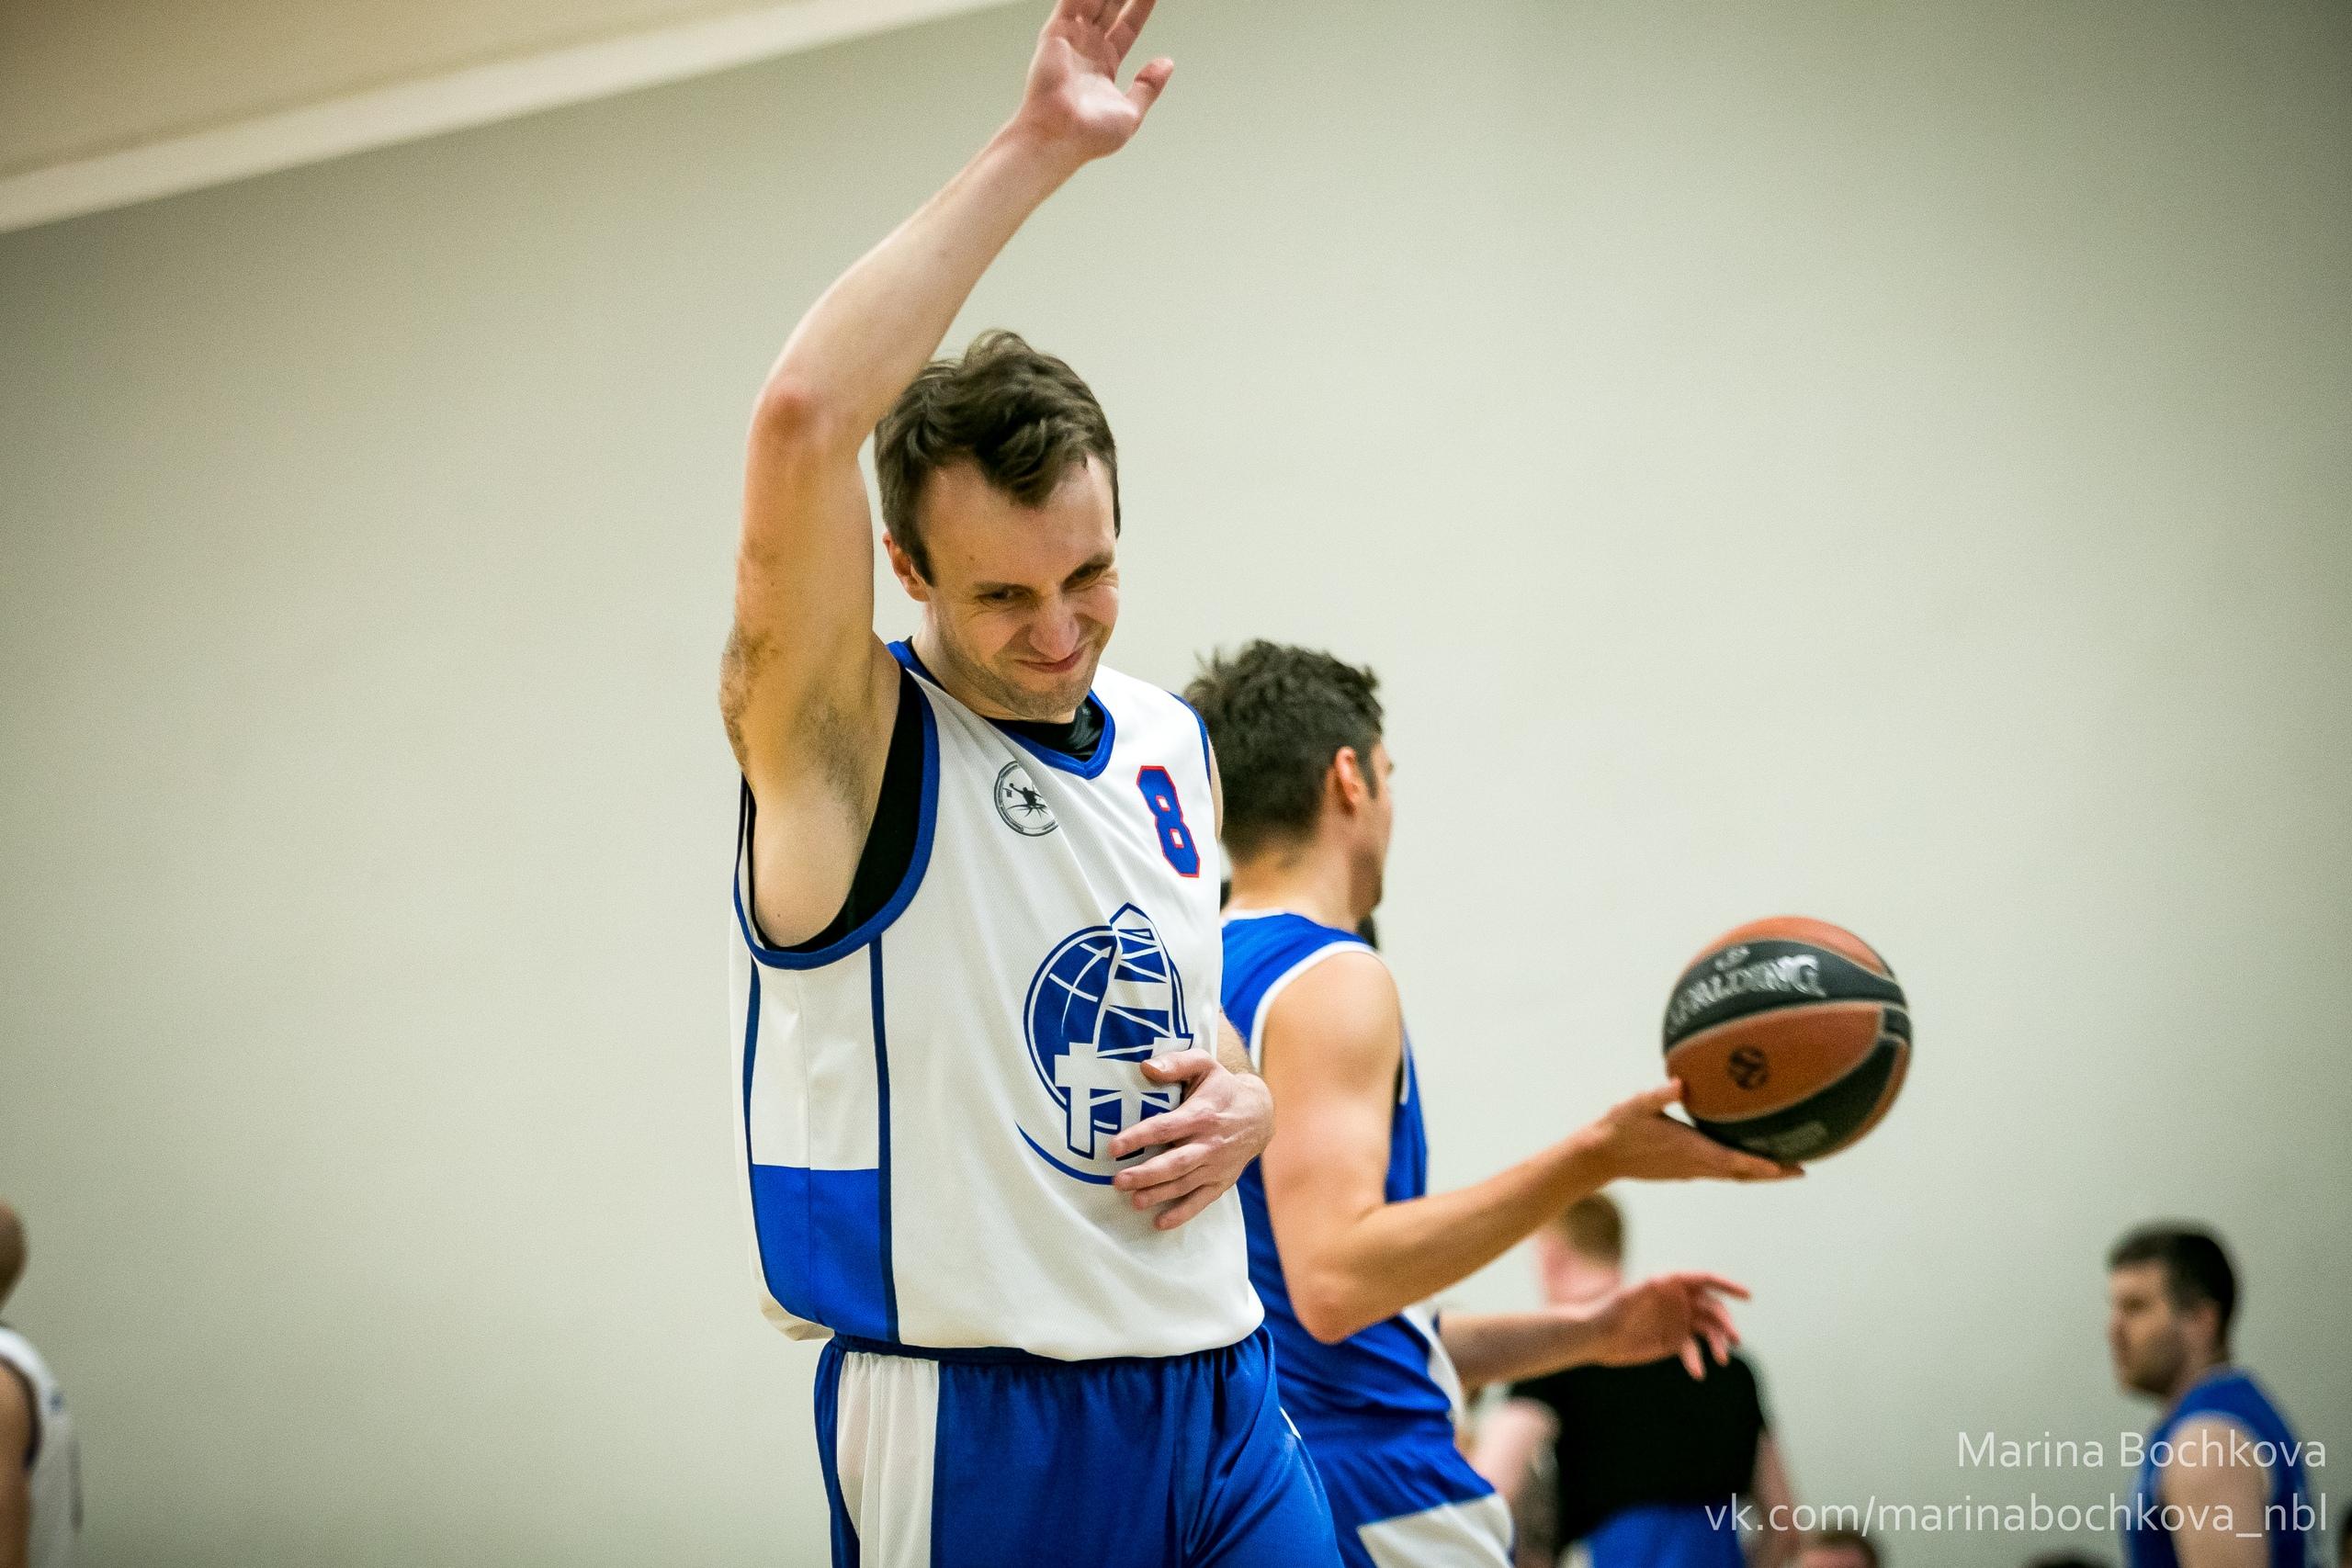 Дмитрий Тетерюк